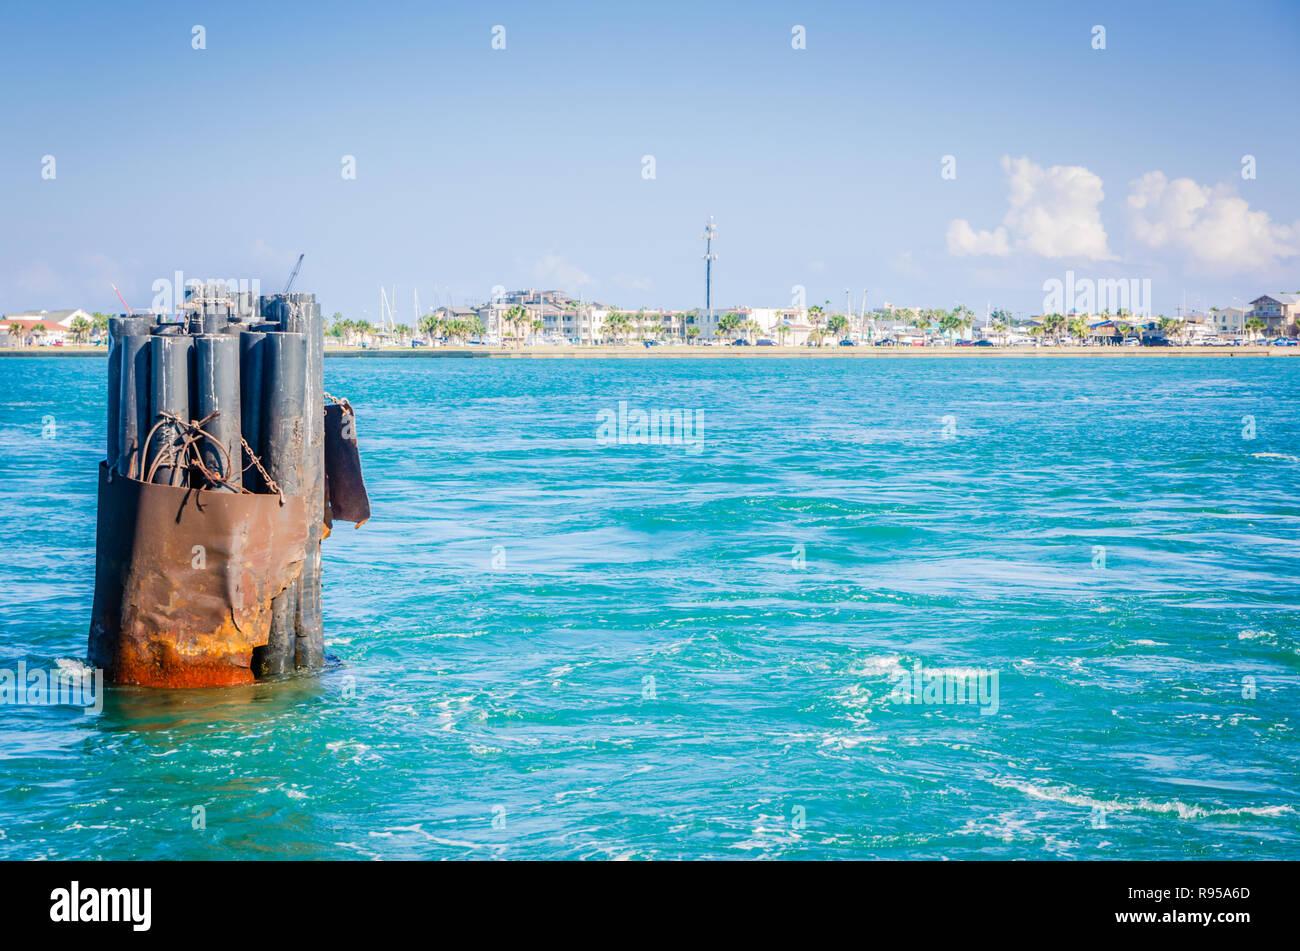 Port Aransas is viewed from the Aransas Pass Ferry Landing, Aug. 25, 2018, in Port Aransas, Texas. - Stock Image